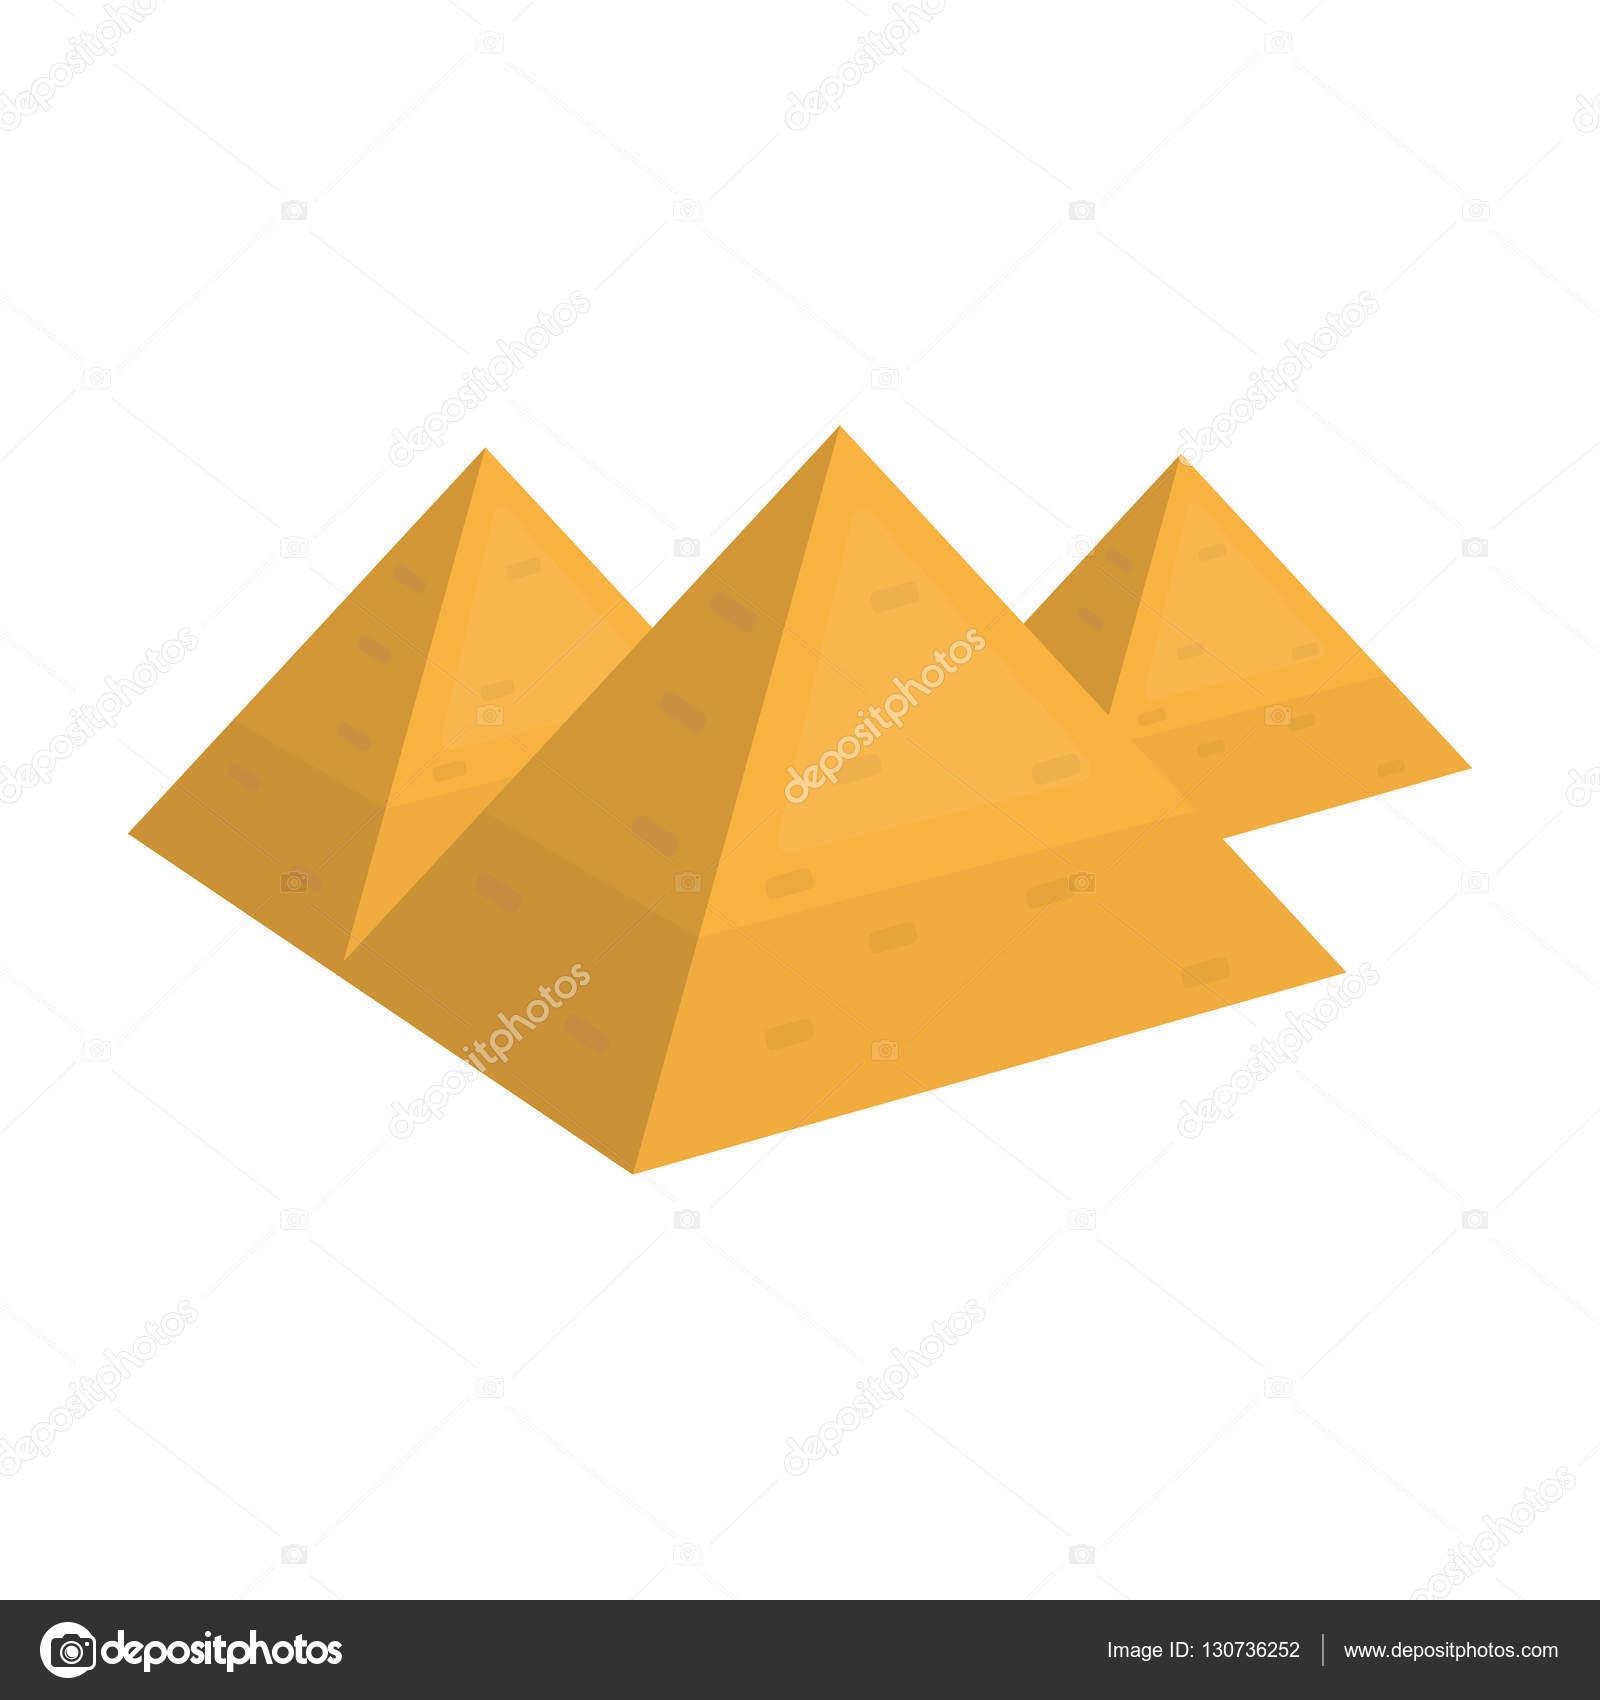 Egyptian pyramids icon in cartoon style isolated on white background egyptian pyramids icon in cartoon style isolated on white background ancient egypt symbol stock vector biocorpaavc Gallery